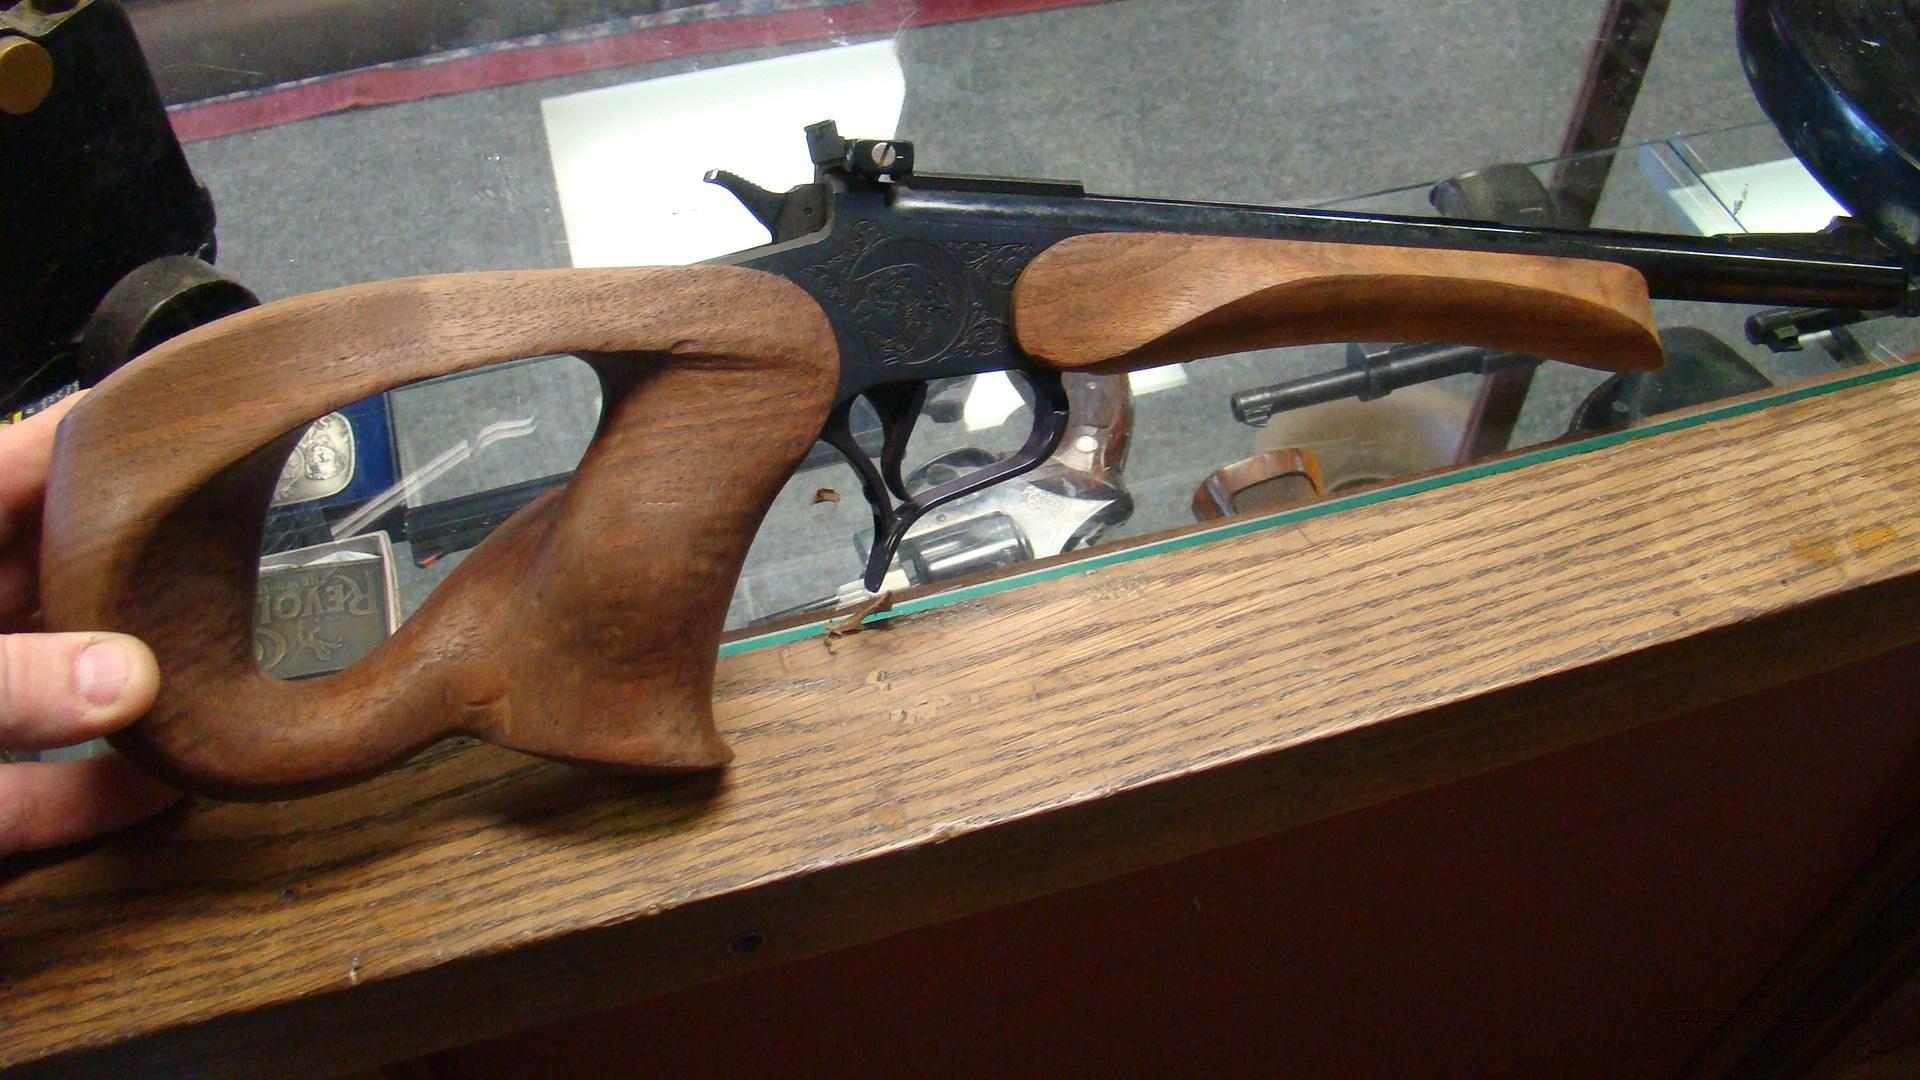 hight resolution of bildergebnis f r thompson center contender parts diagram thompson contender thompson center diagram guns